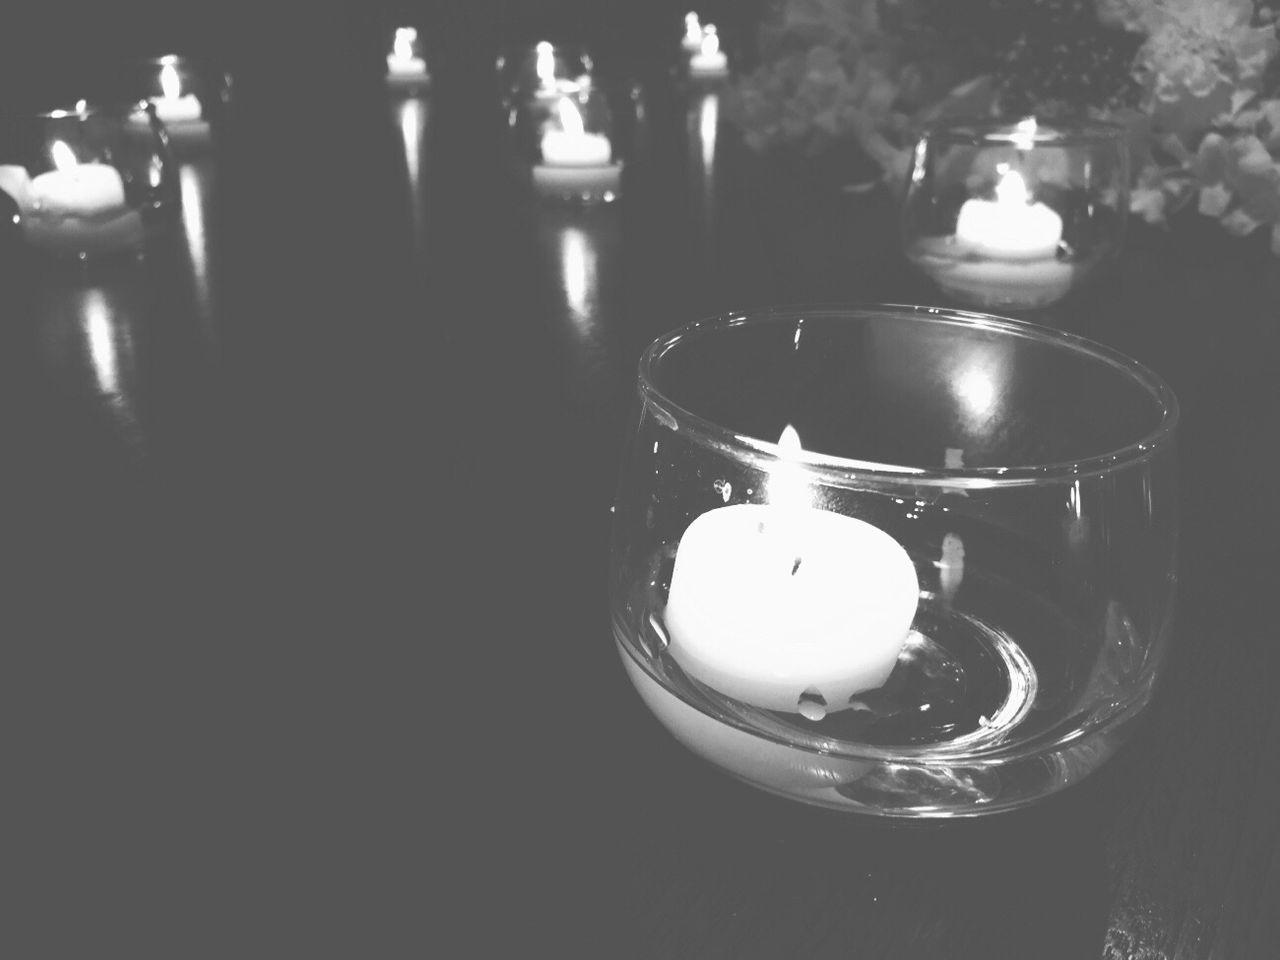 candle, flame, burning, heat - temperature, tea light, glowing, illuminated, close-up, indoors, no people, night, oil lamp